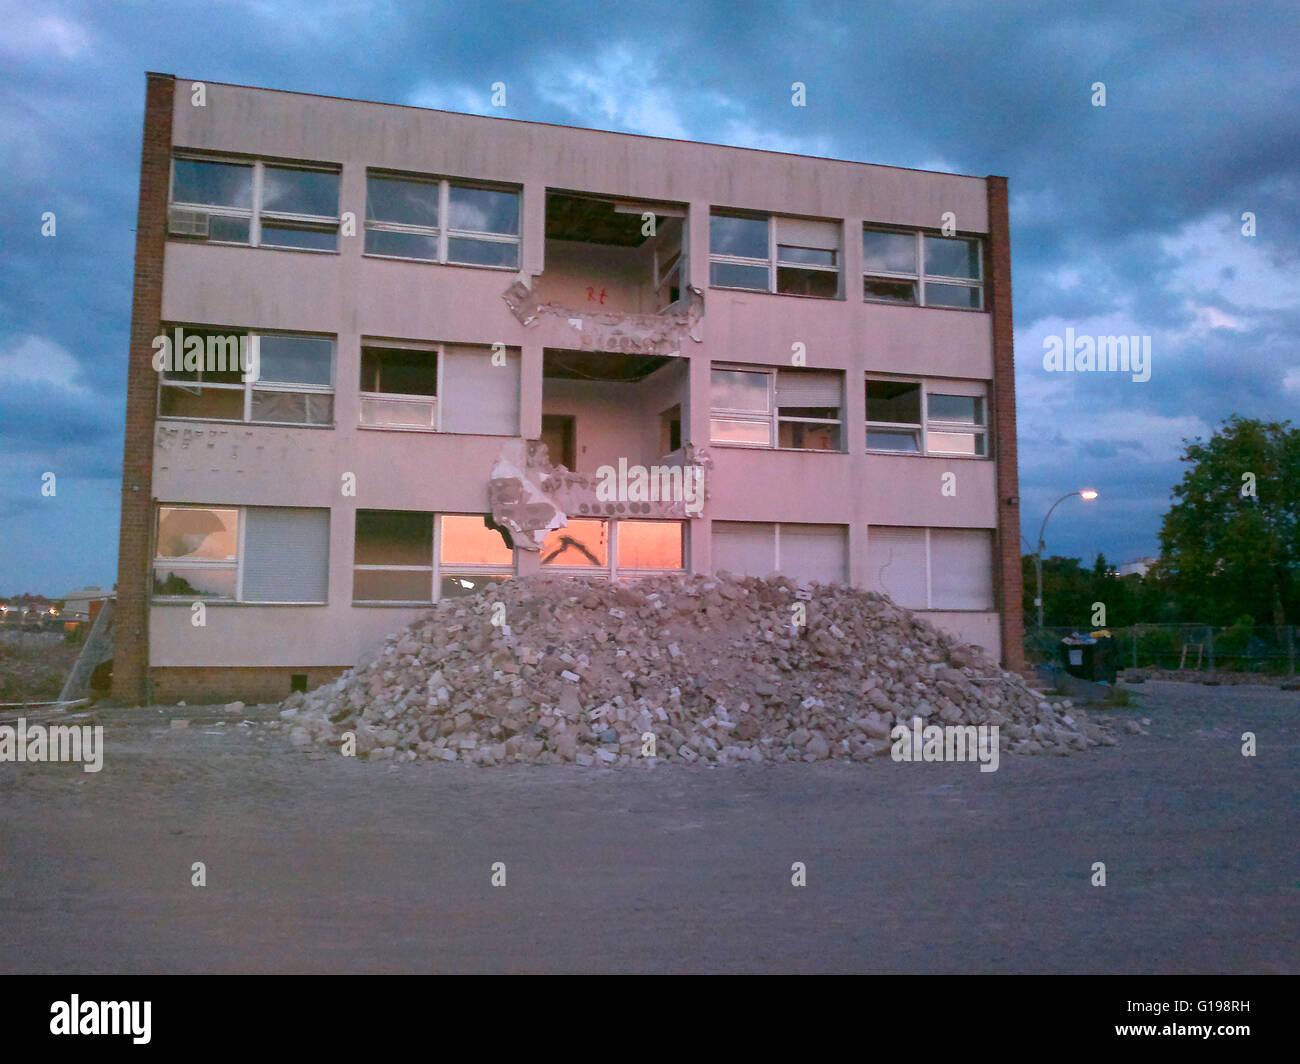 Abriss an der Baustelle fuer die 'Europacity', Berlin. - Stock Image